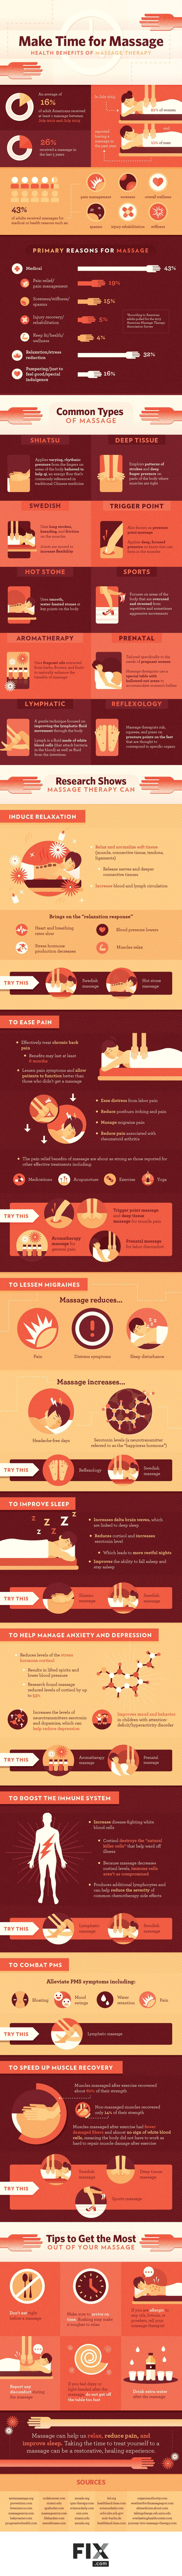 Make Time for Massage: Health Benefits of Massage